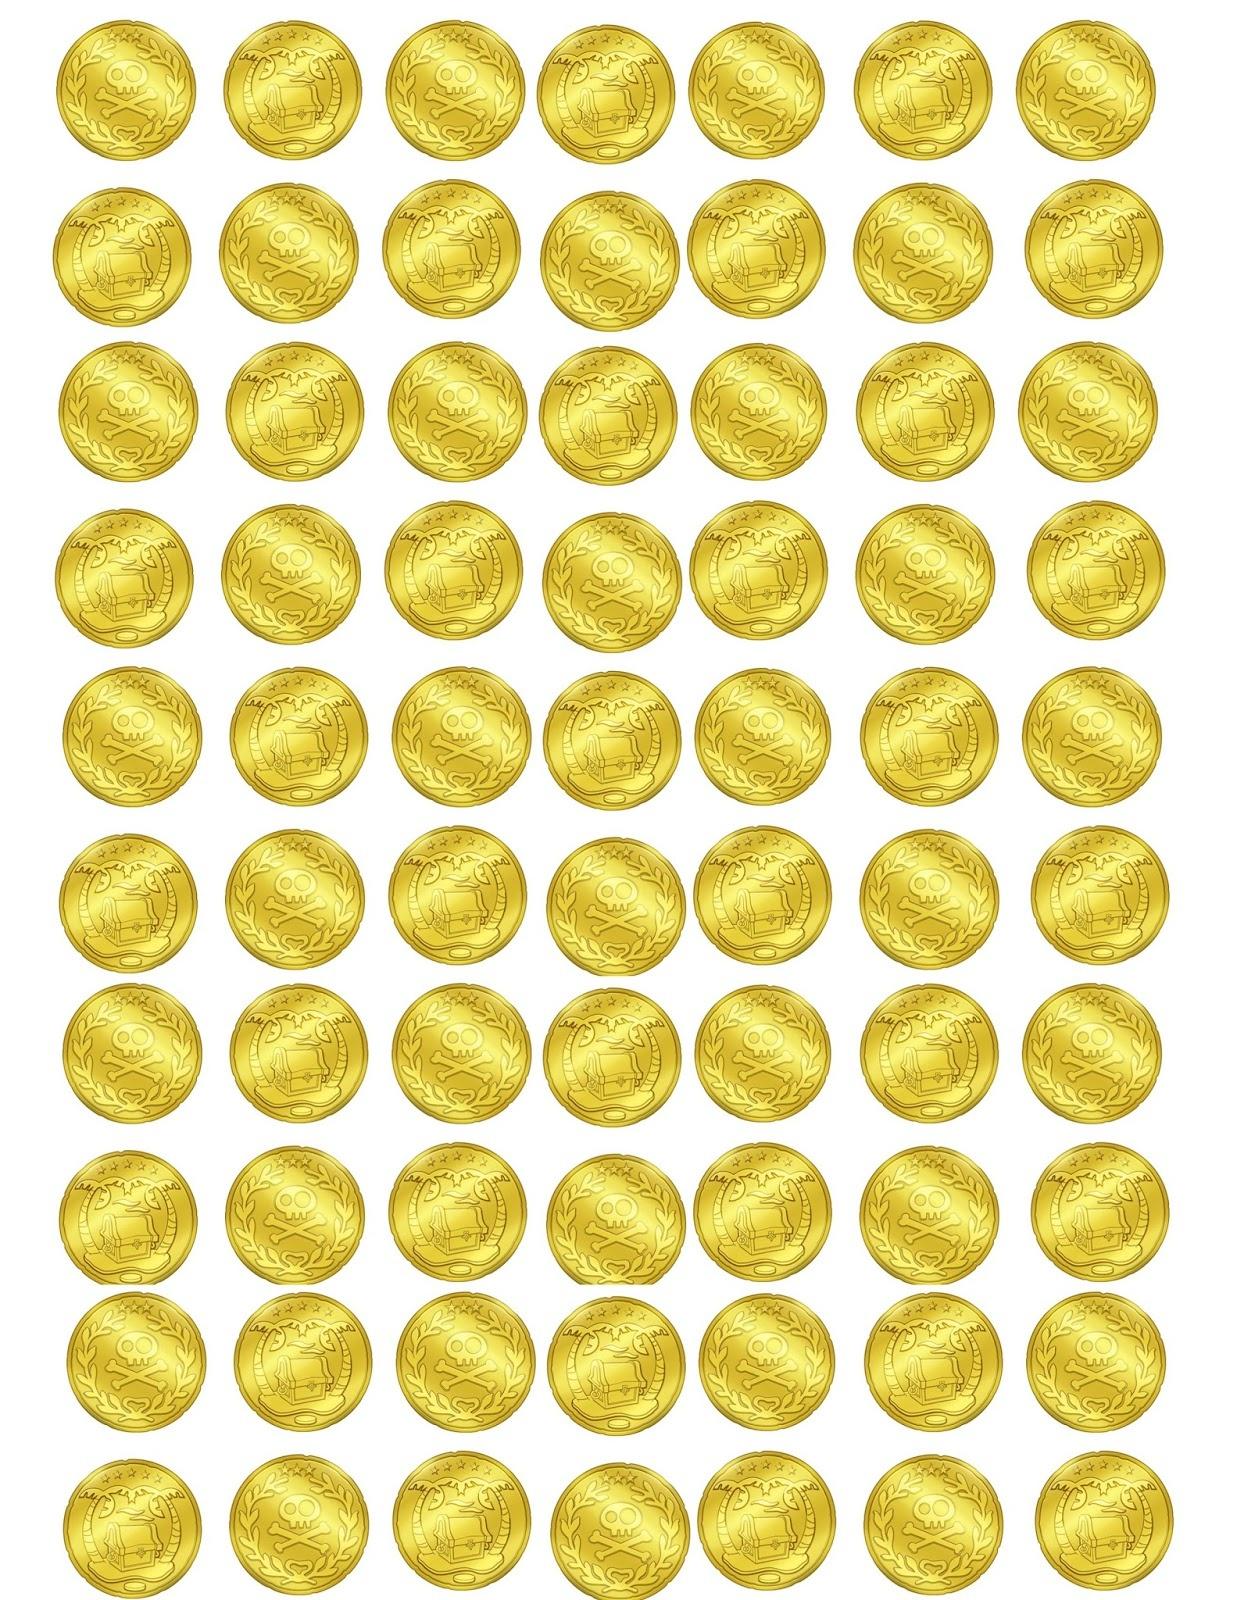 Musings Of An Average Mom: Jake And The Neverland Pirates Bingo - Free Printable Bingo Chips